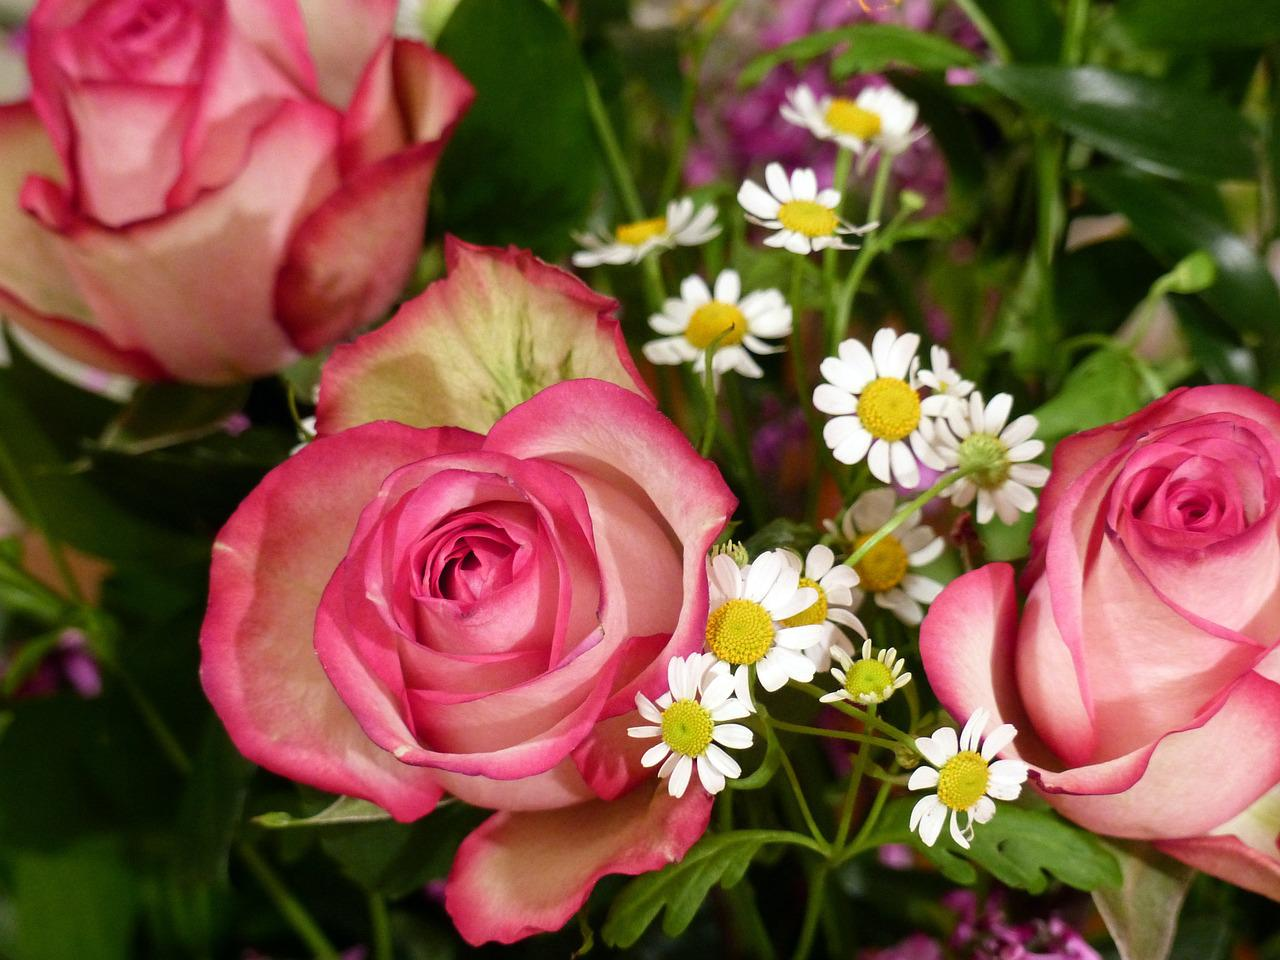 Цветы эквадор фото и названия